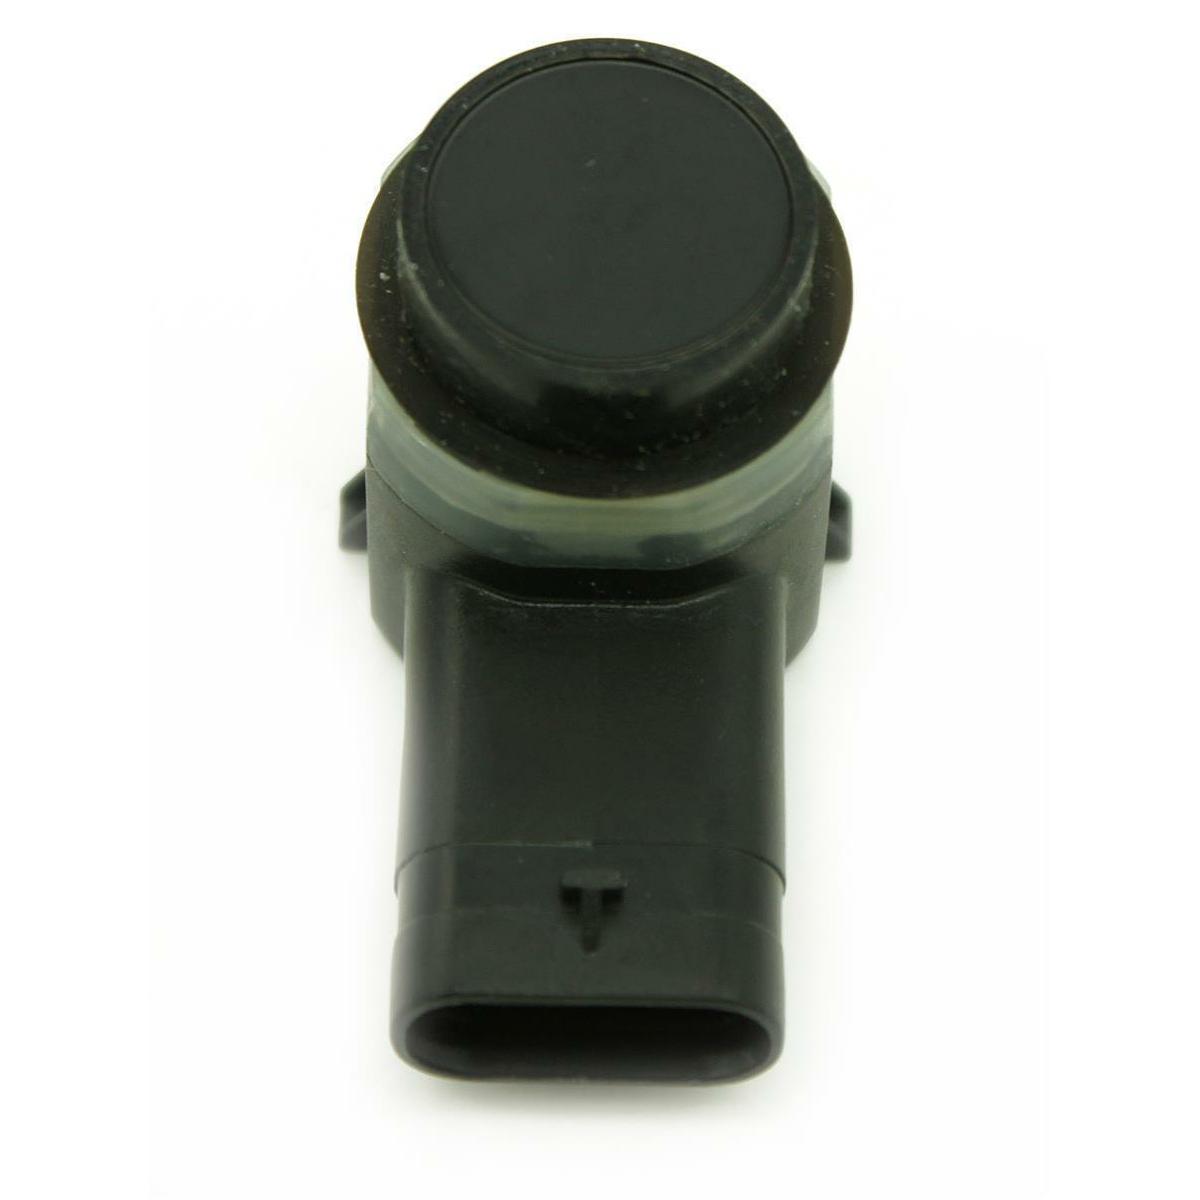 Parksensor AM5Z-15K859-AAPTM für Ford PDC Parktronic